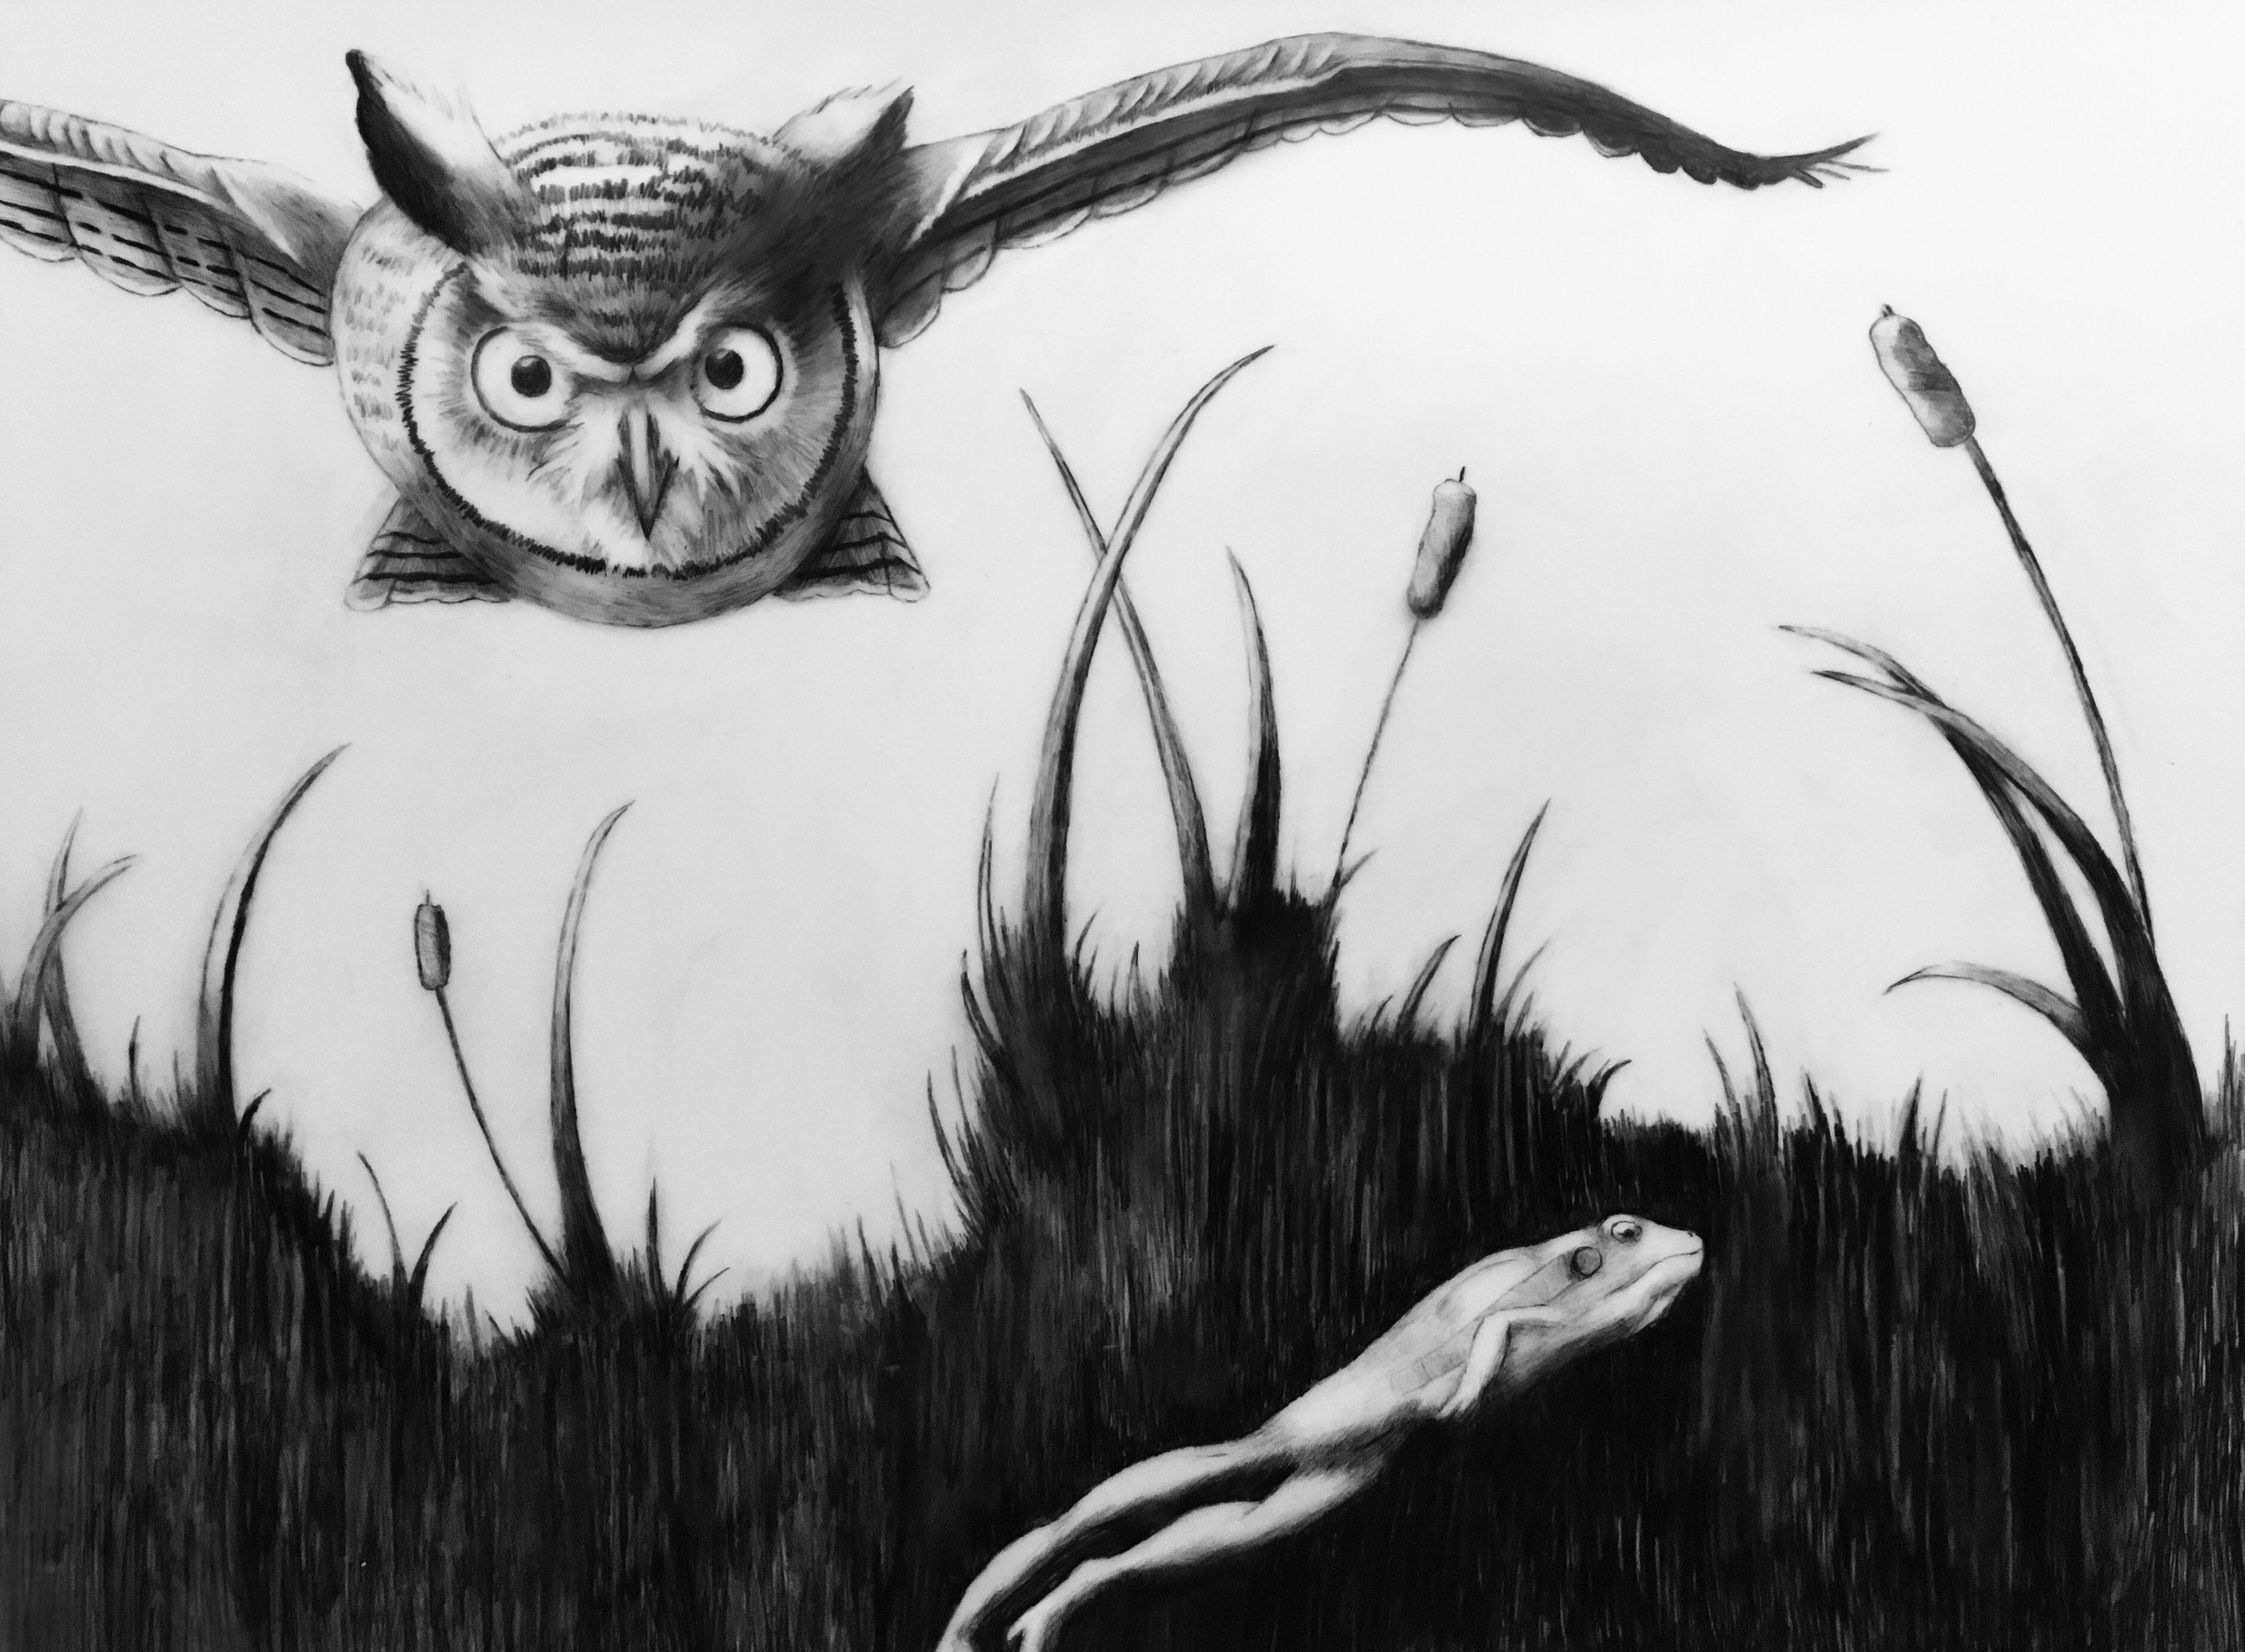 Krister-Owl-Frog-Pencil-Final